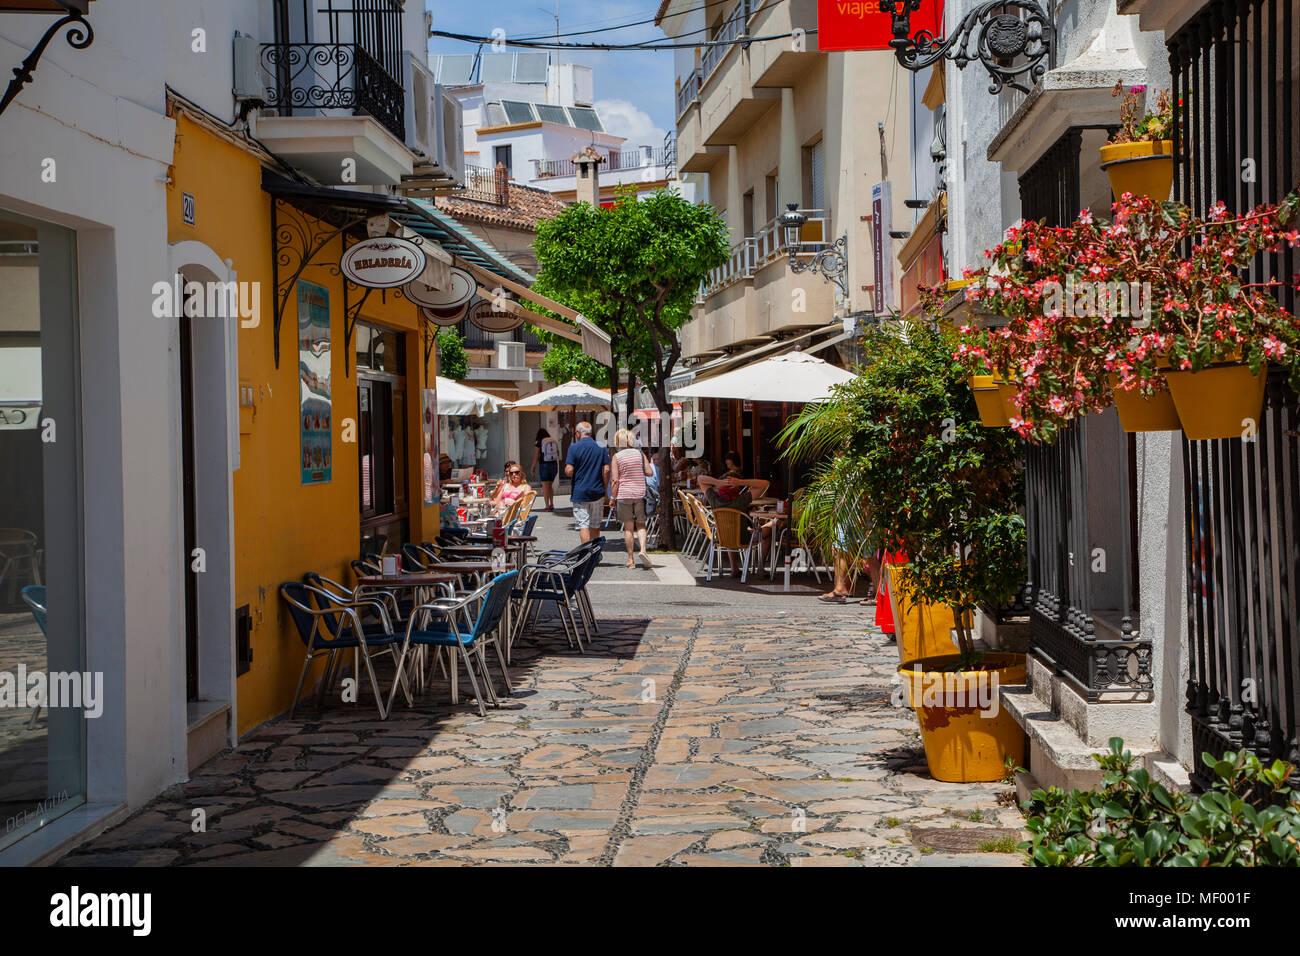 Estepona, Malaga, Spain: A colourful street scene: tourists browse the local restaurants - Stock Image